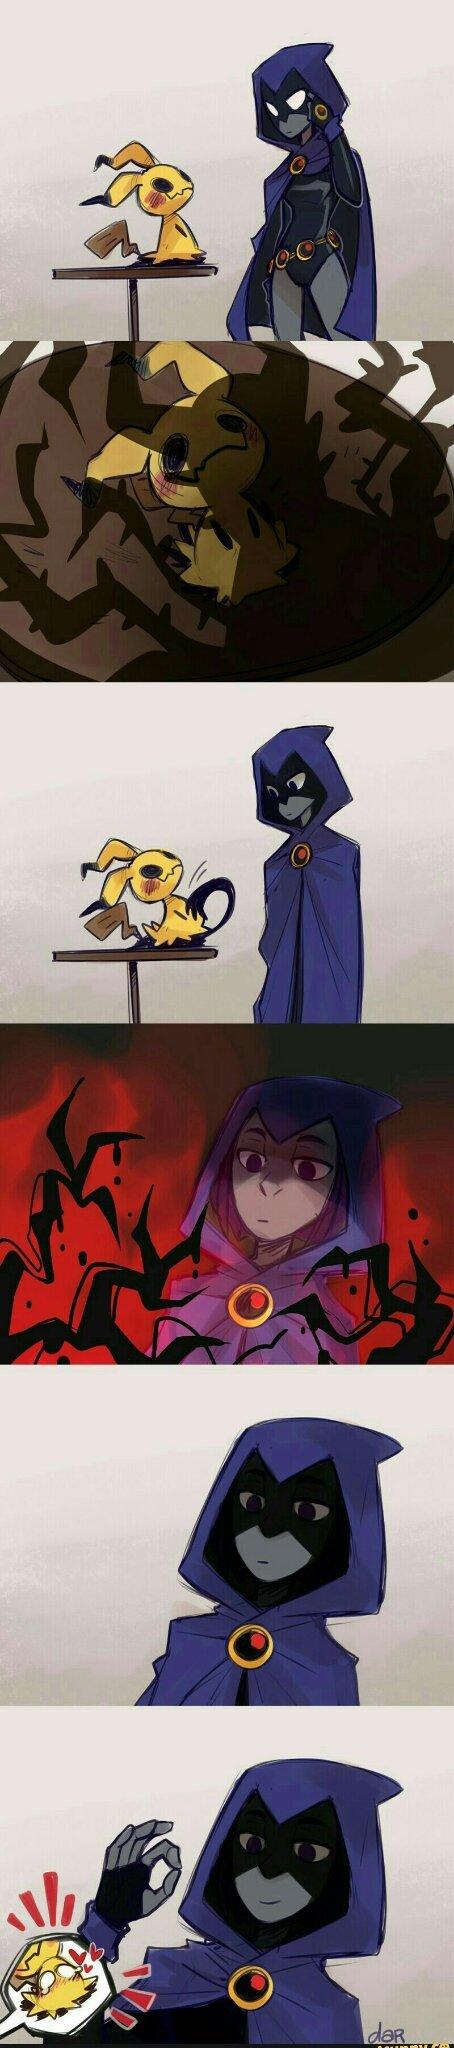 Mimikyu is best - meme